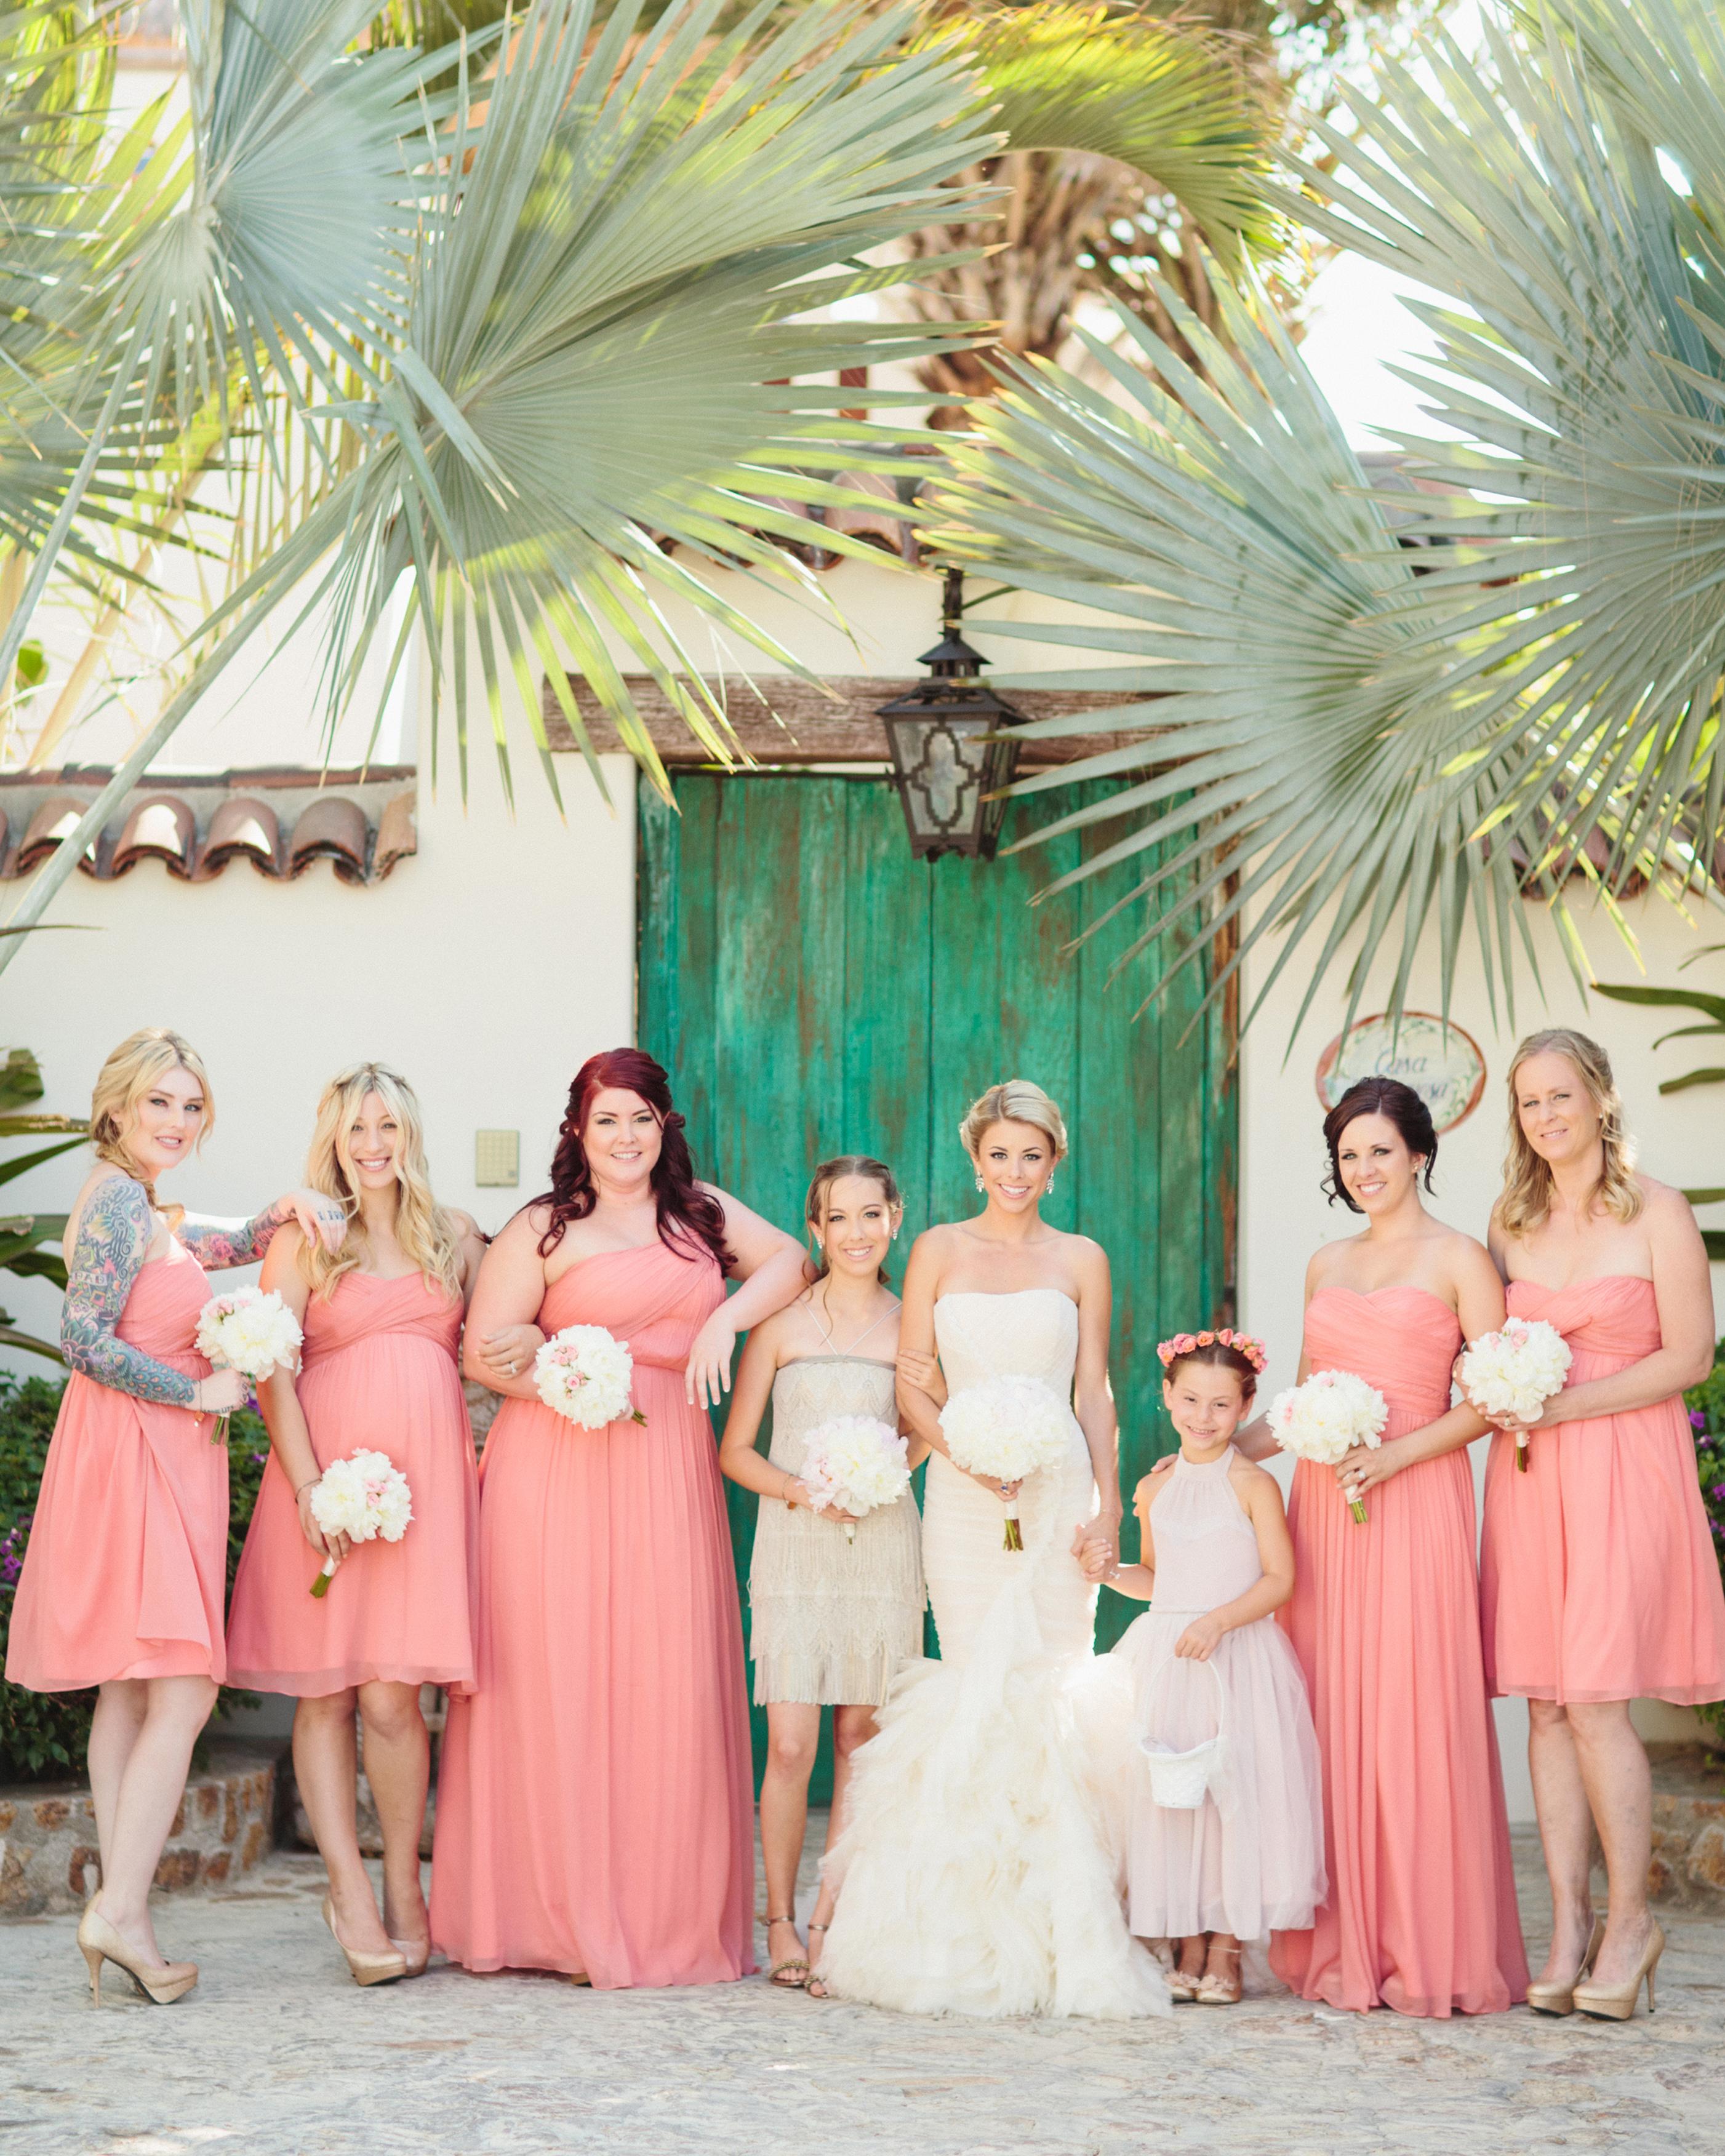 erica-steve-wedding-bridesmaids-0314.jpg